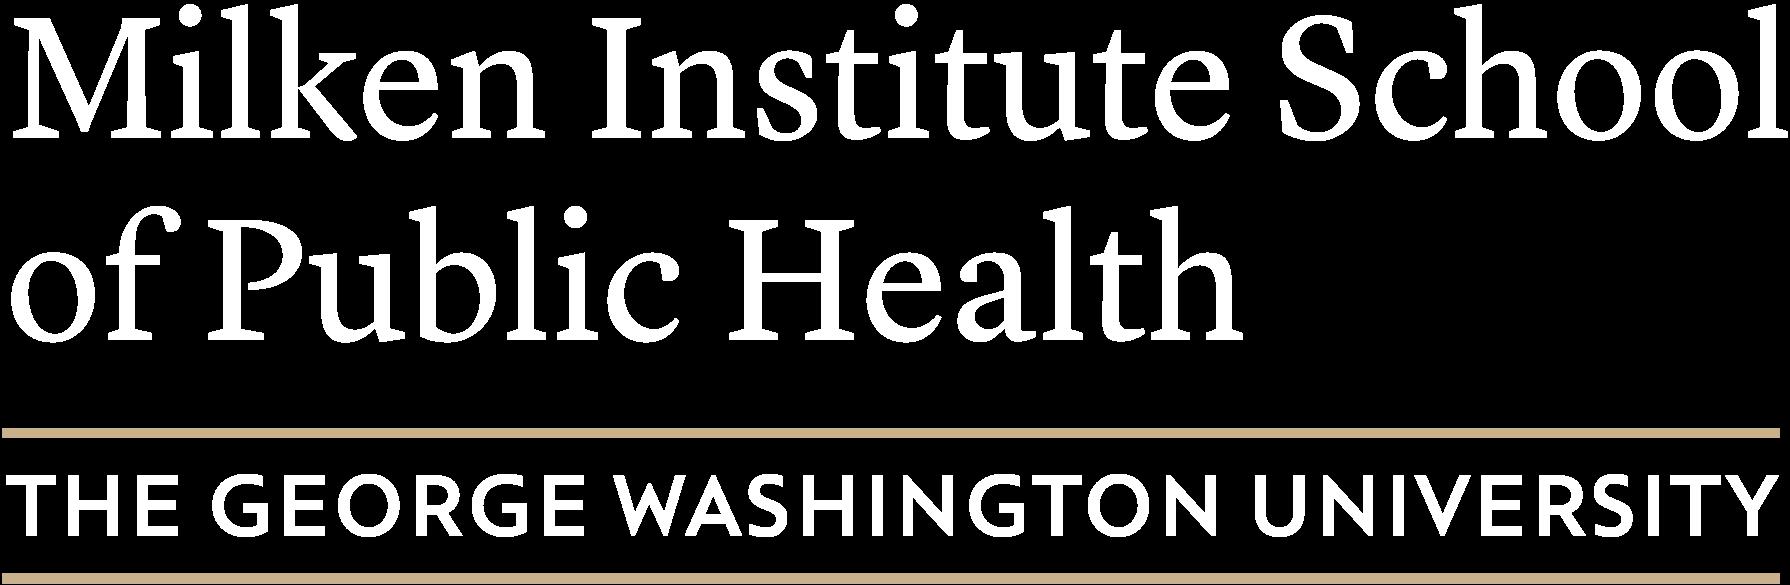 George Washington University Milken Institute School of Public Health - home